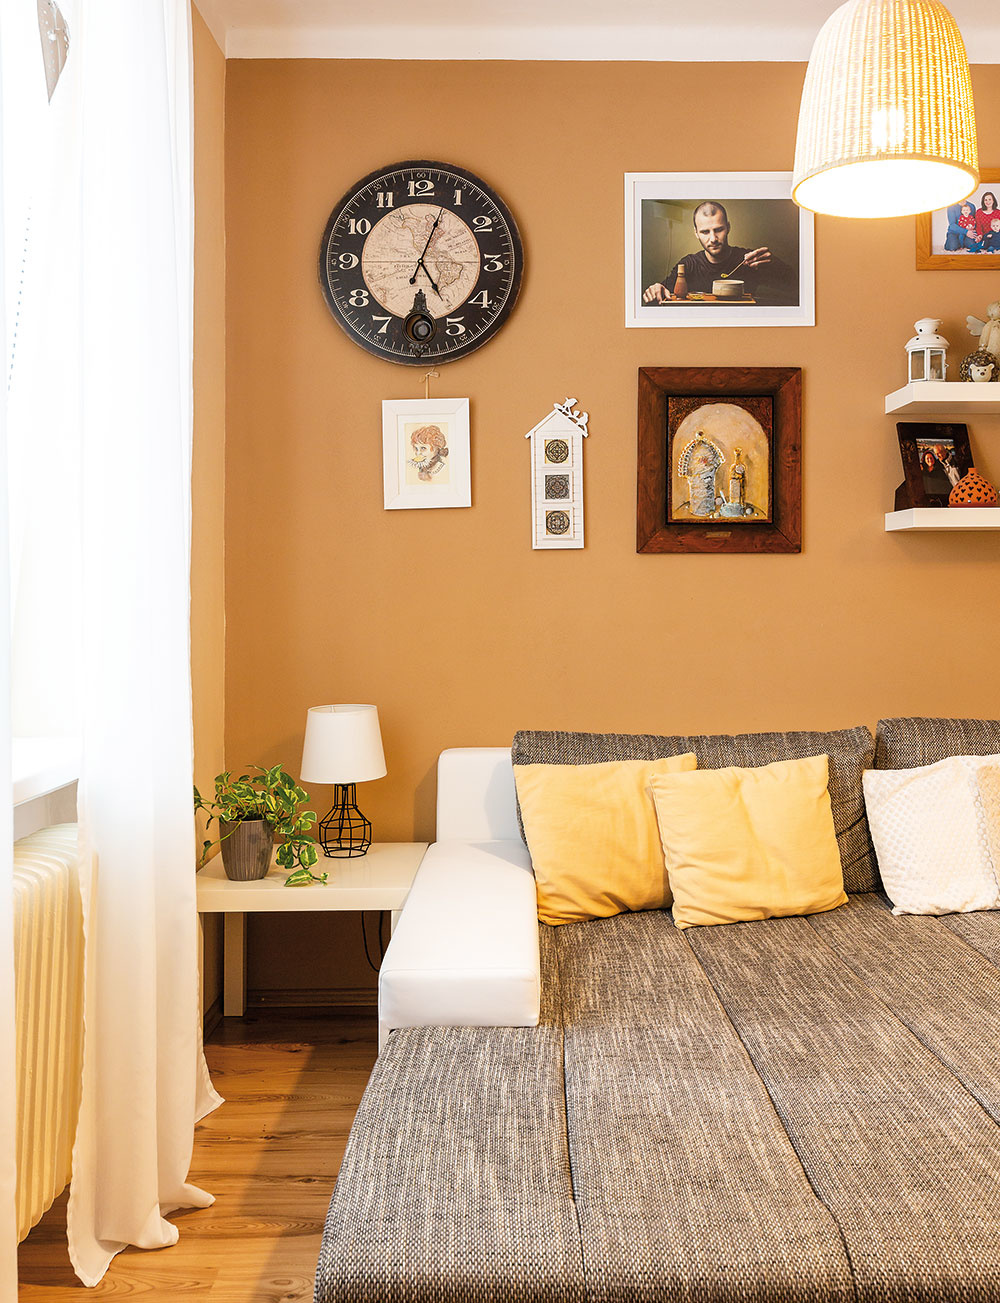 obrázky a foto na stene